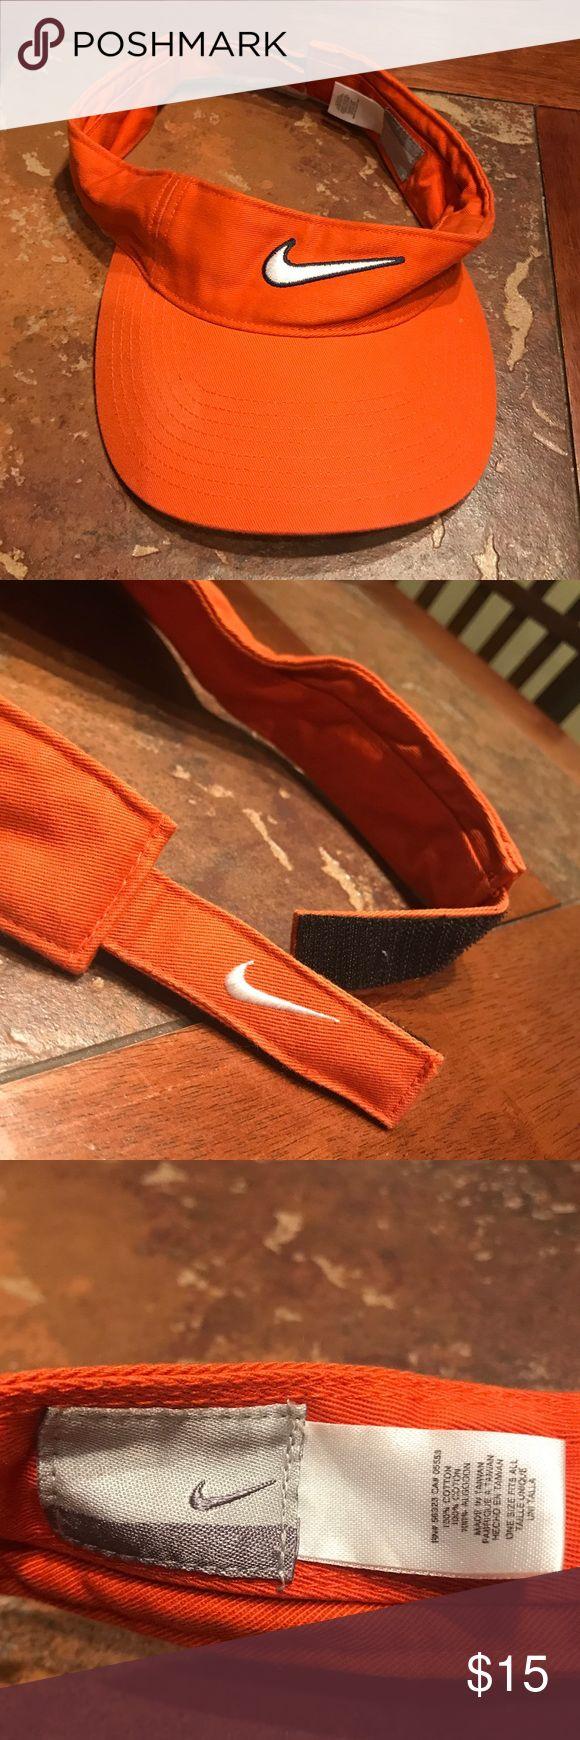 Orange NIKE visor All orange with white Nike symbols Velcro in the back Nike Accessories Hats